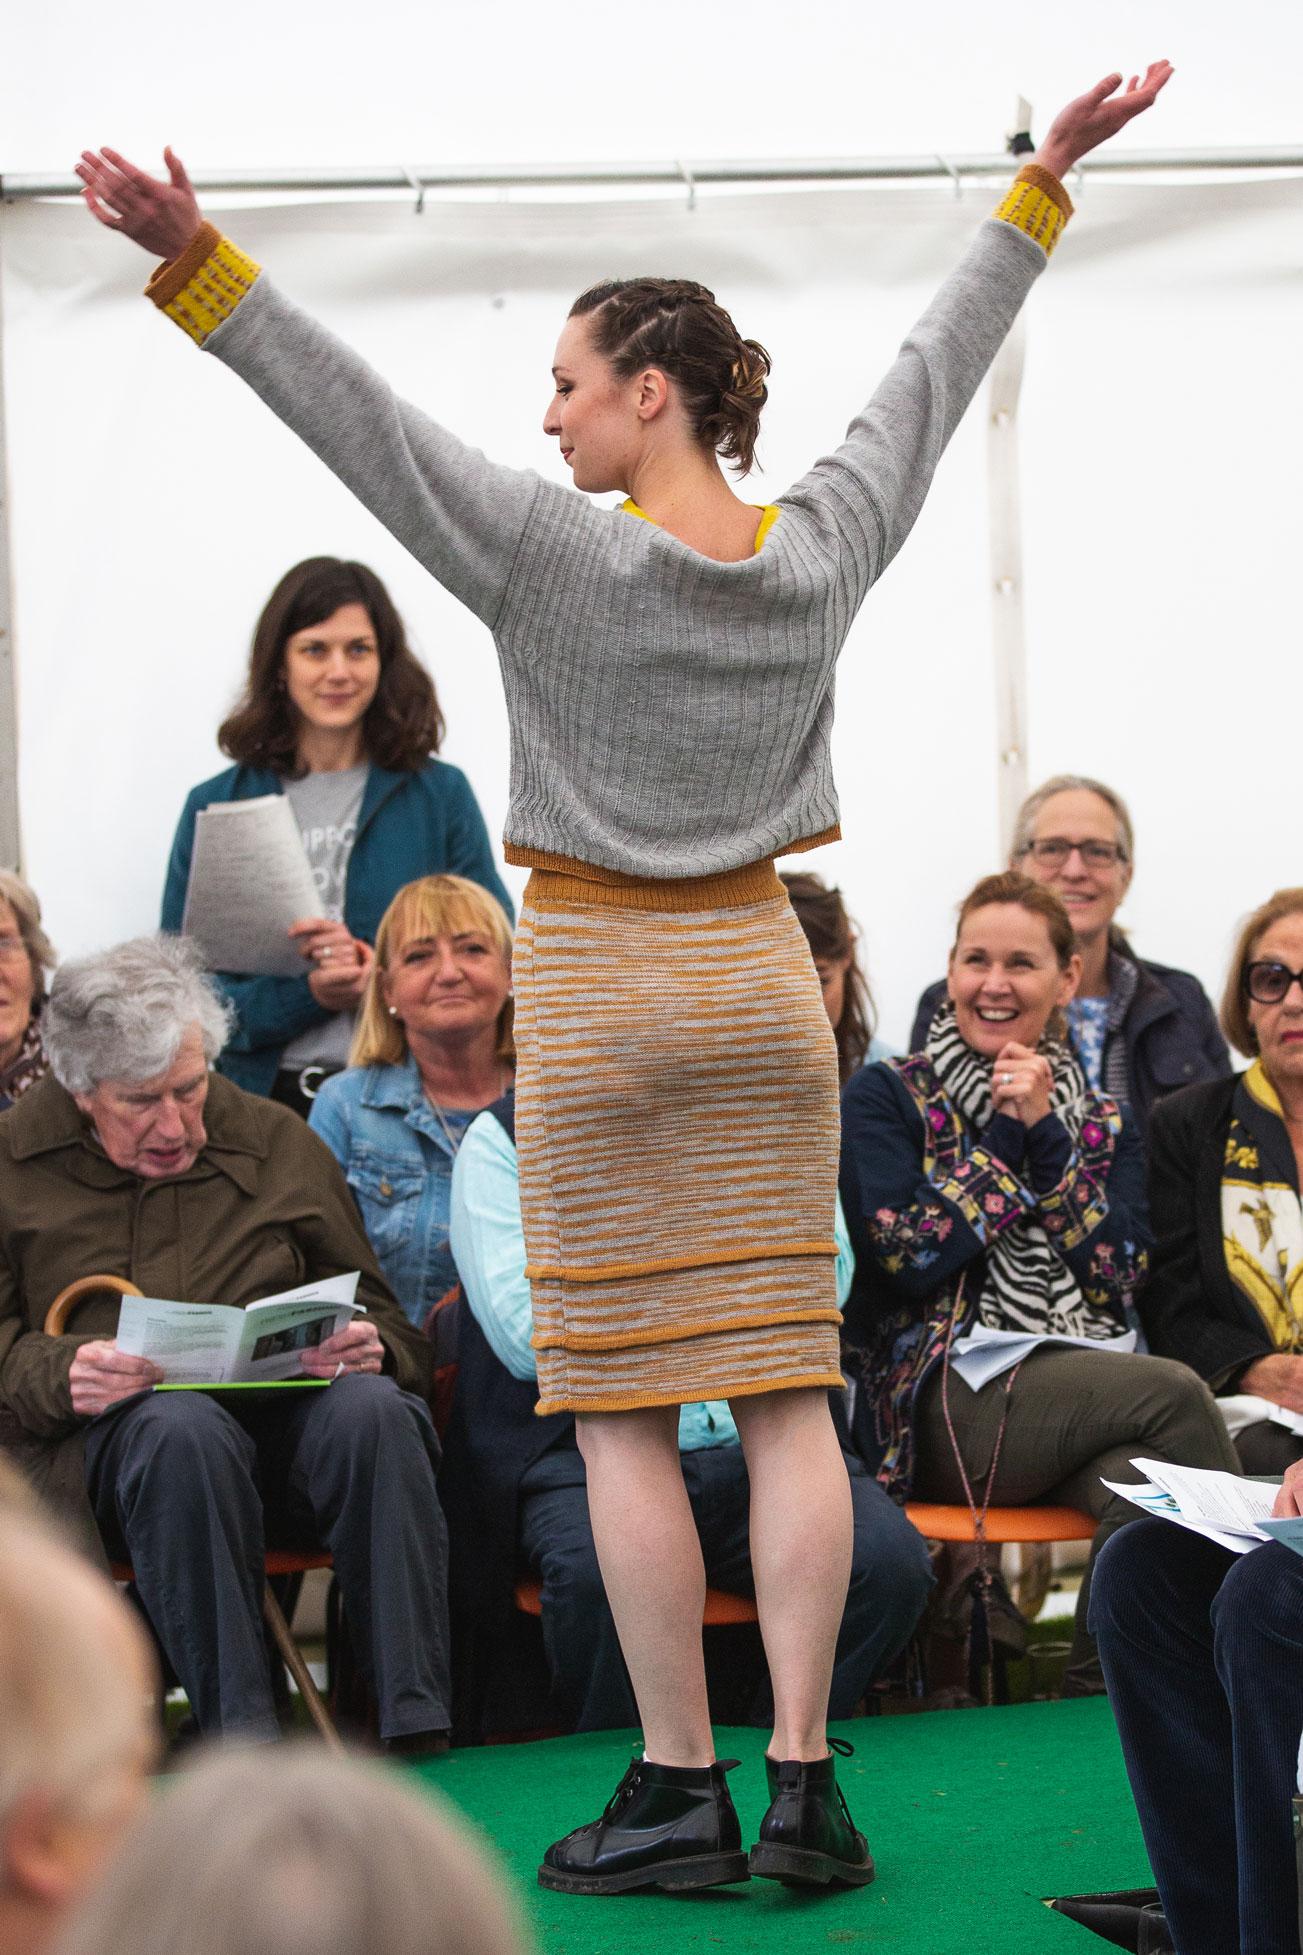 ria-burns-knitwear-fresh-air-fashion-2019-jumper-skirt-knitted-naturally-dyed.jpg